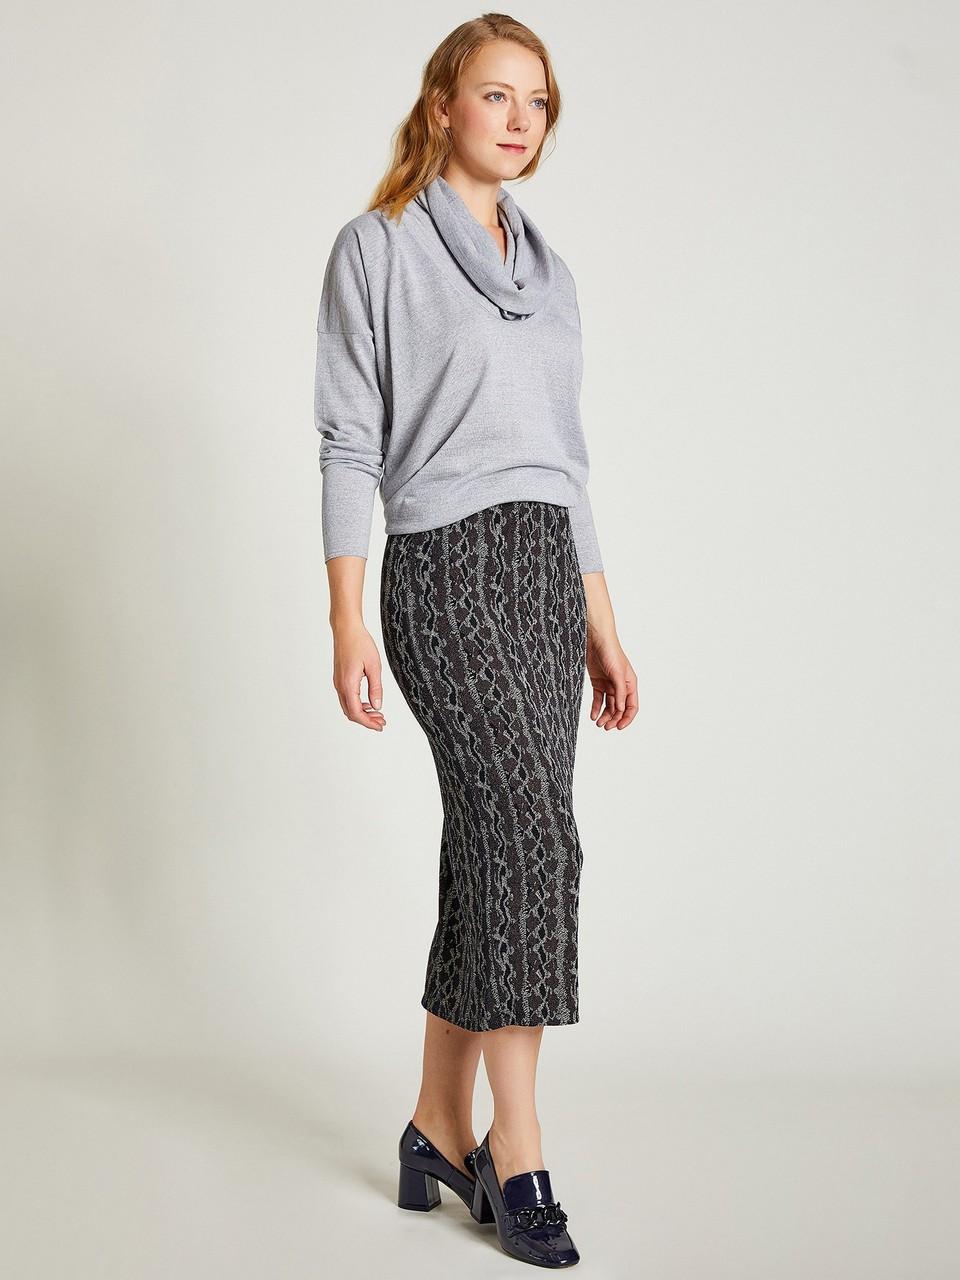 Patterned Midi Size Skirt